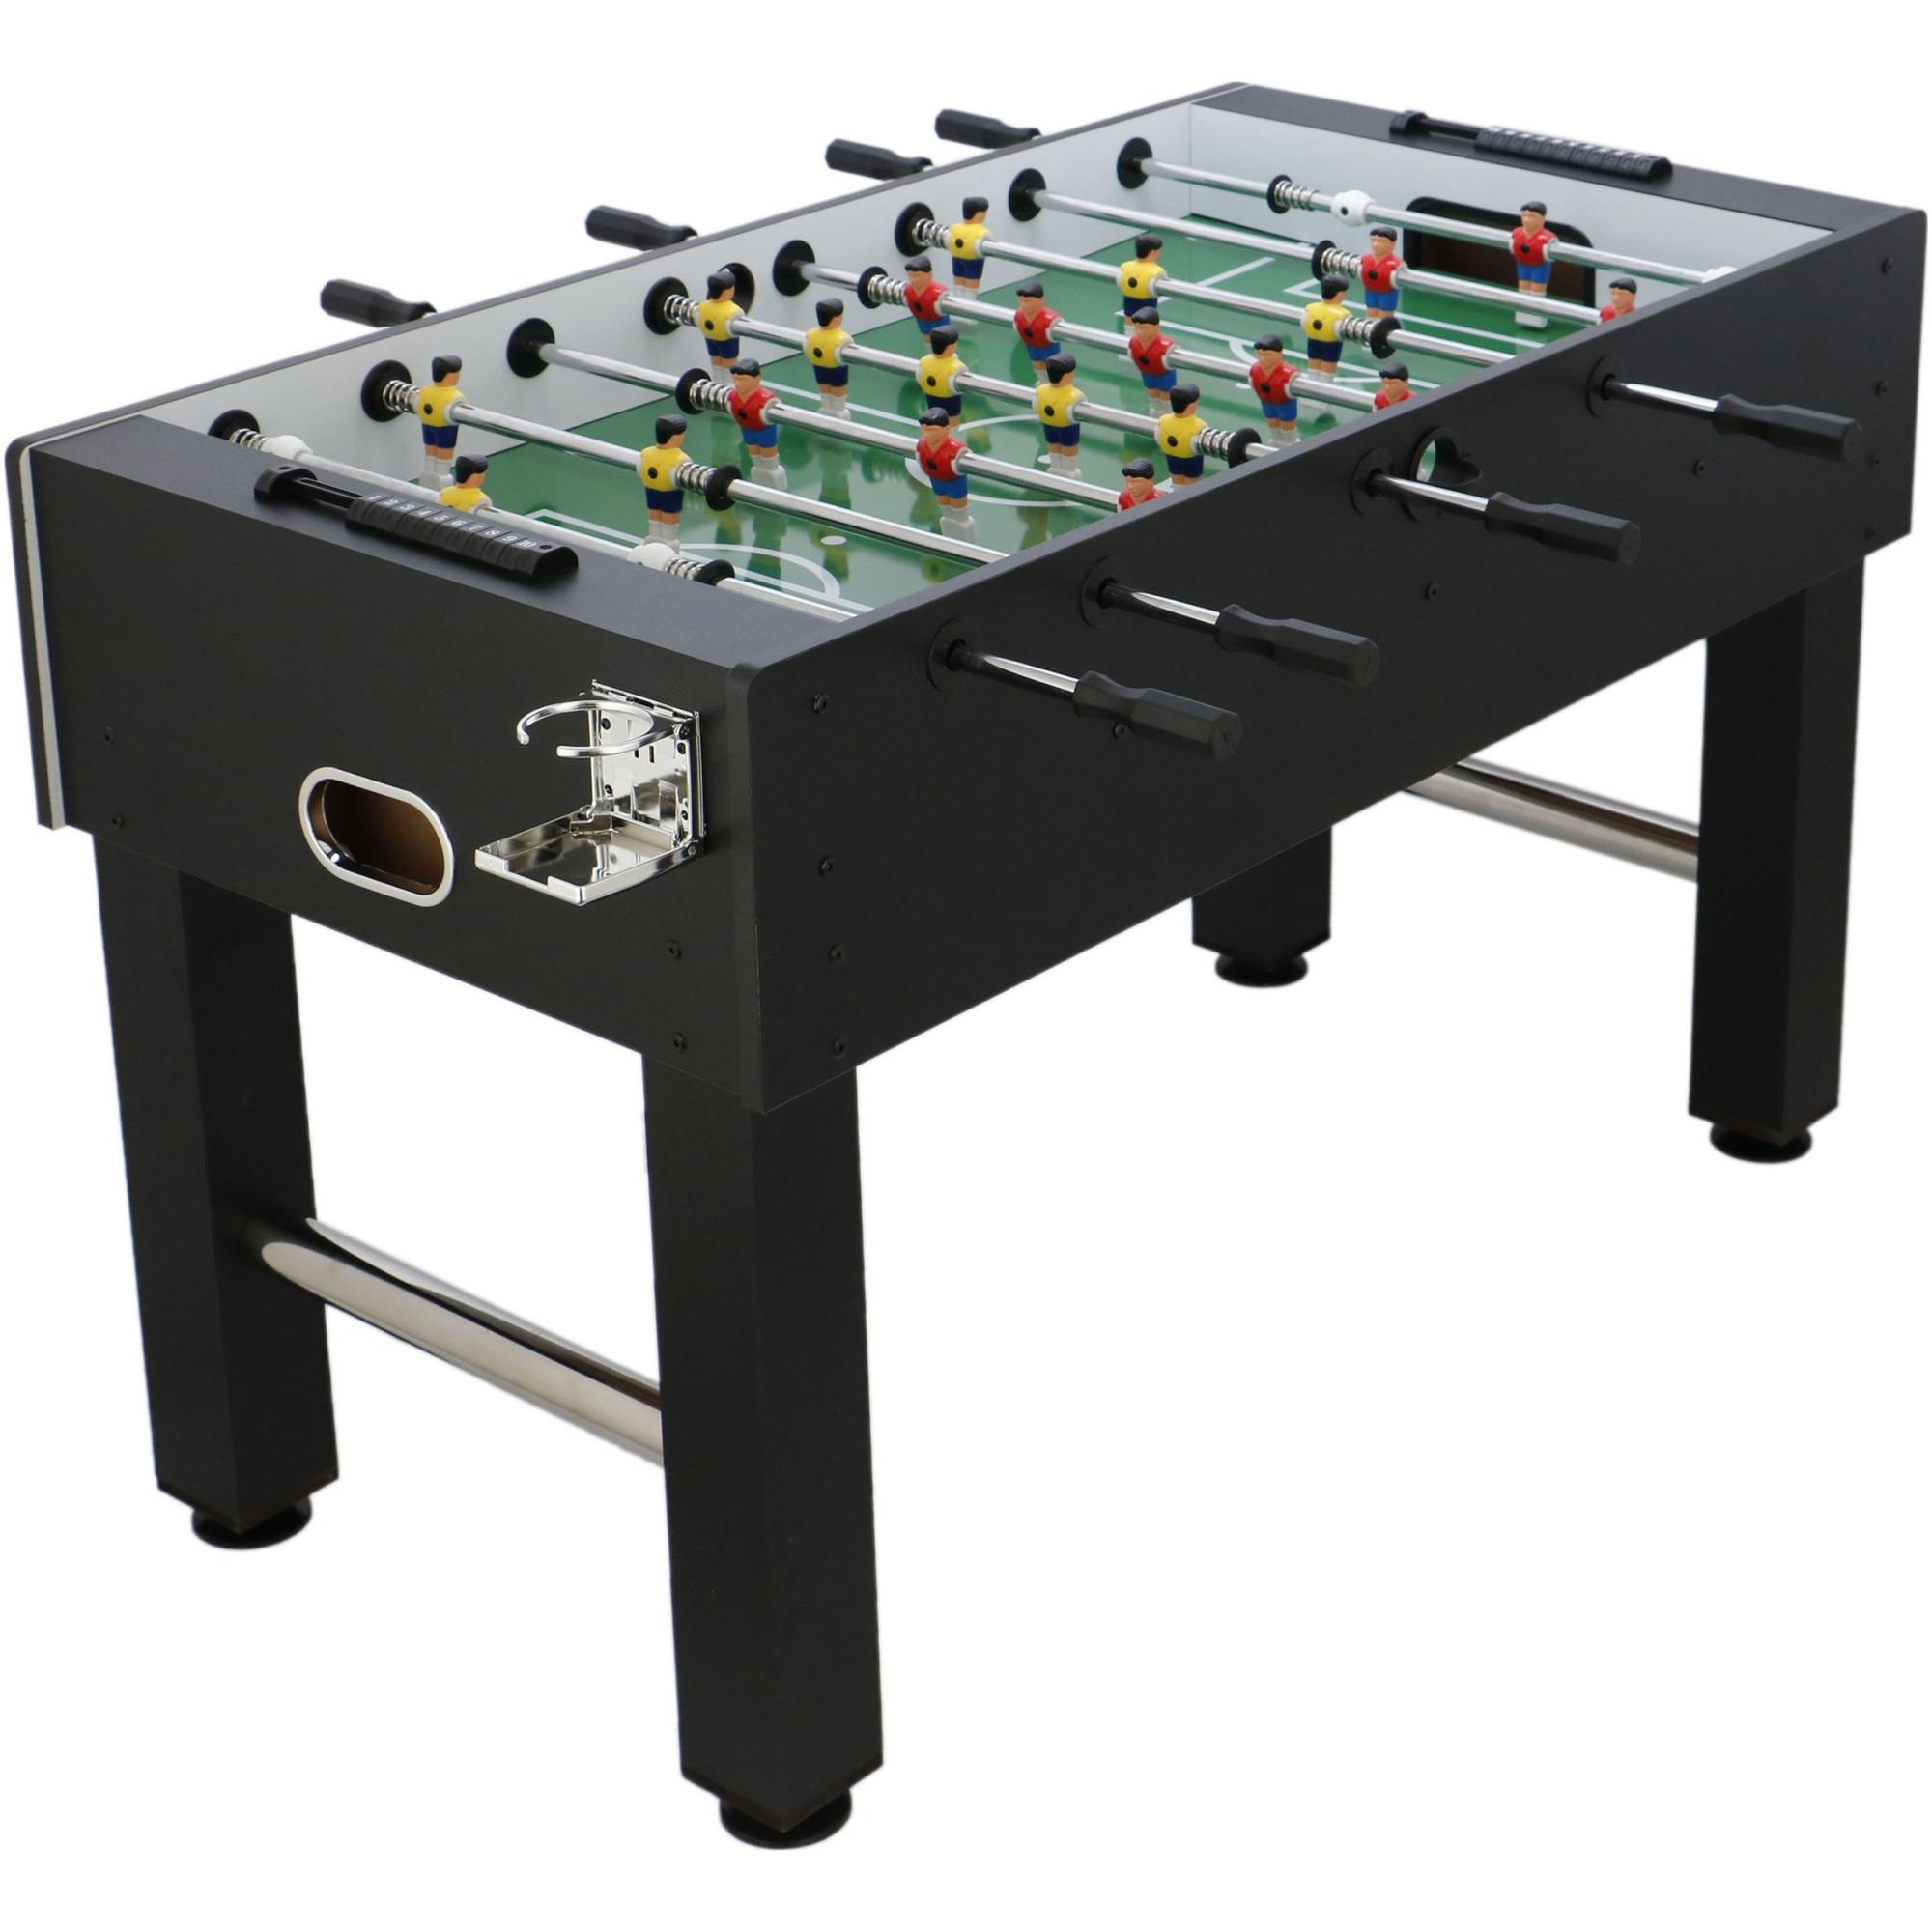 Fotografie Masa fotbal(foosball) 138x71x87 cm, culoare negru-verde